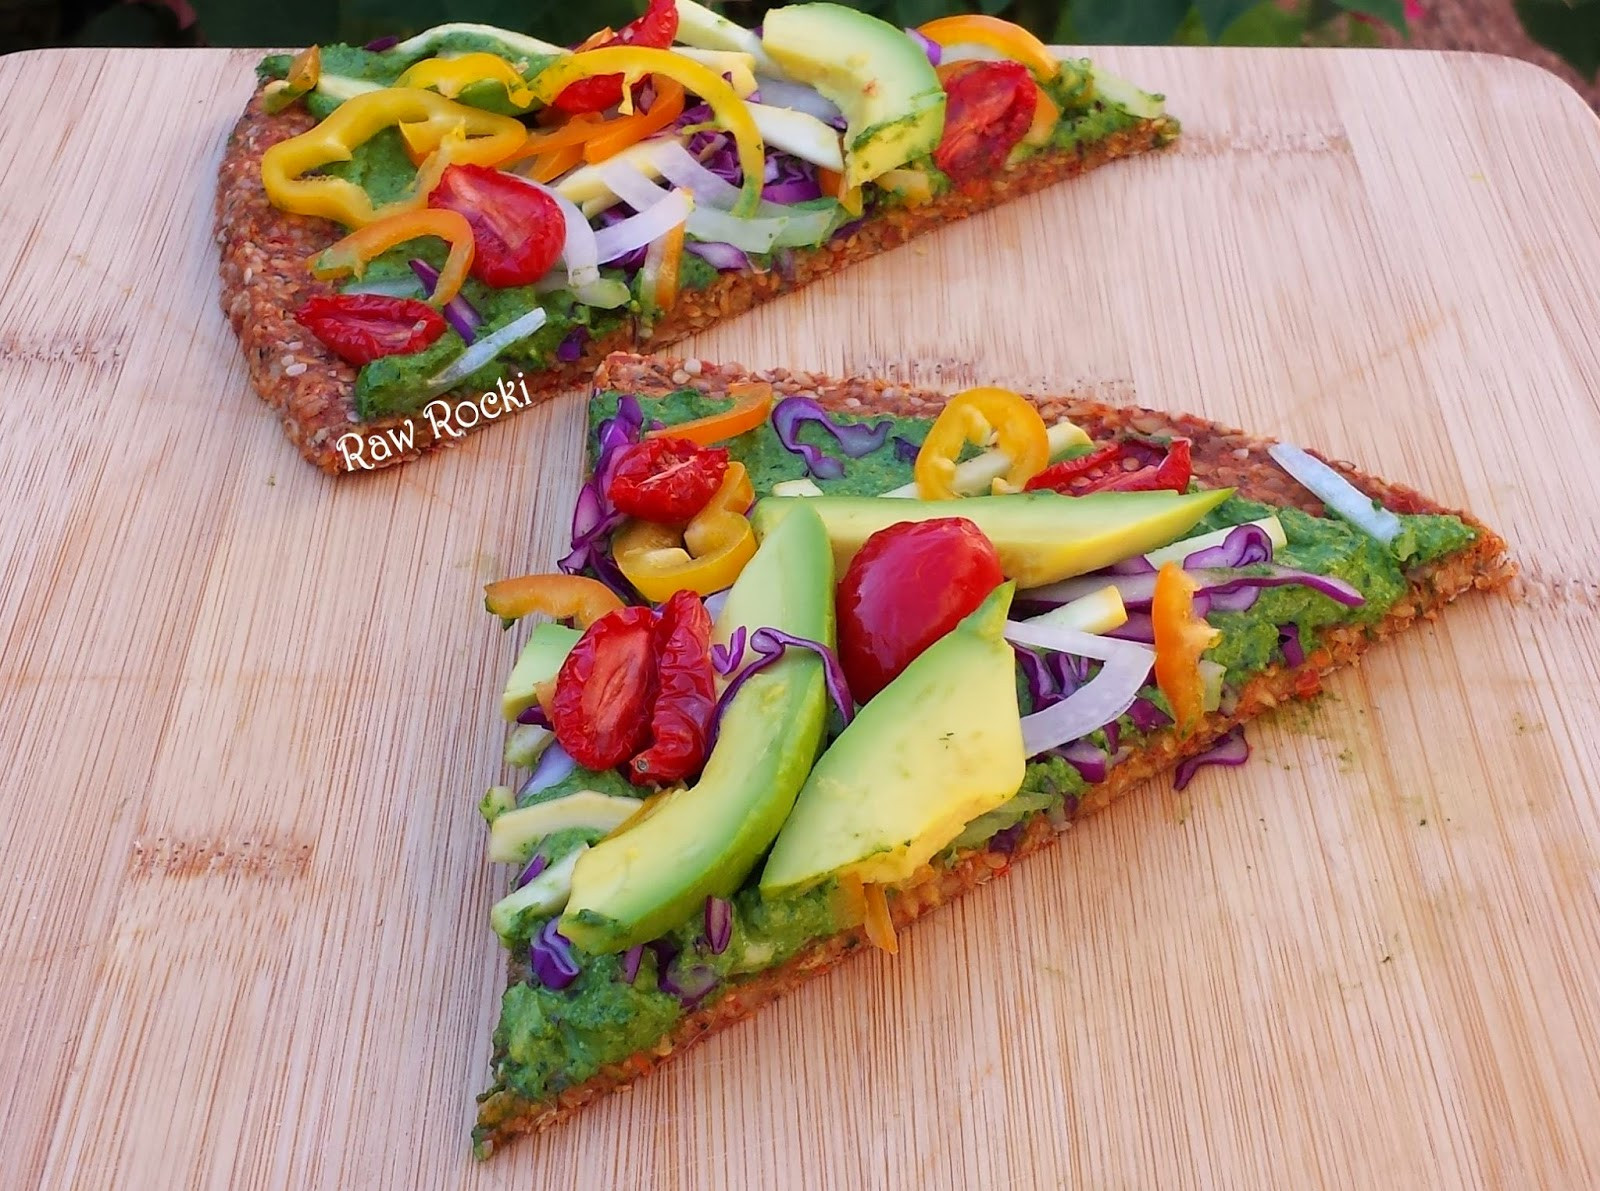 Healthy Raw Vegan Recipes  Raw Vegan Recipes by Rocki Raw Vegan Pizza with Spinach